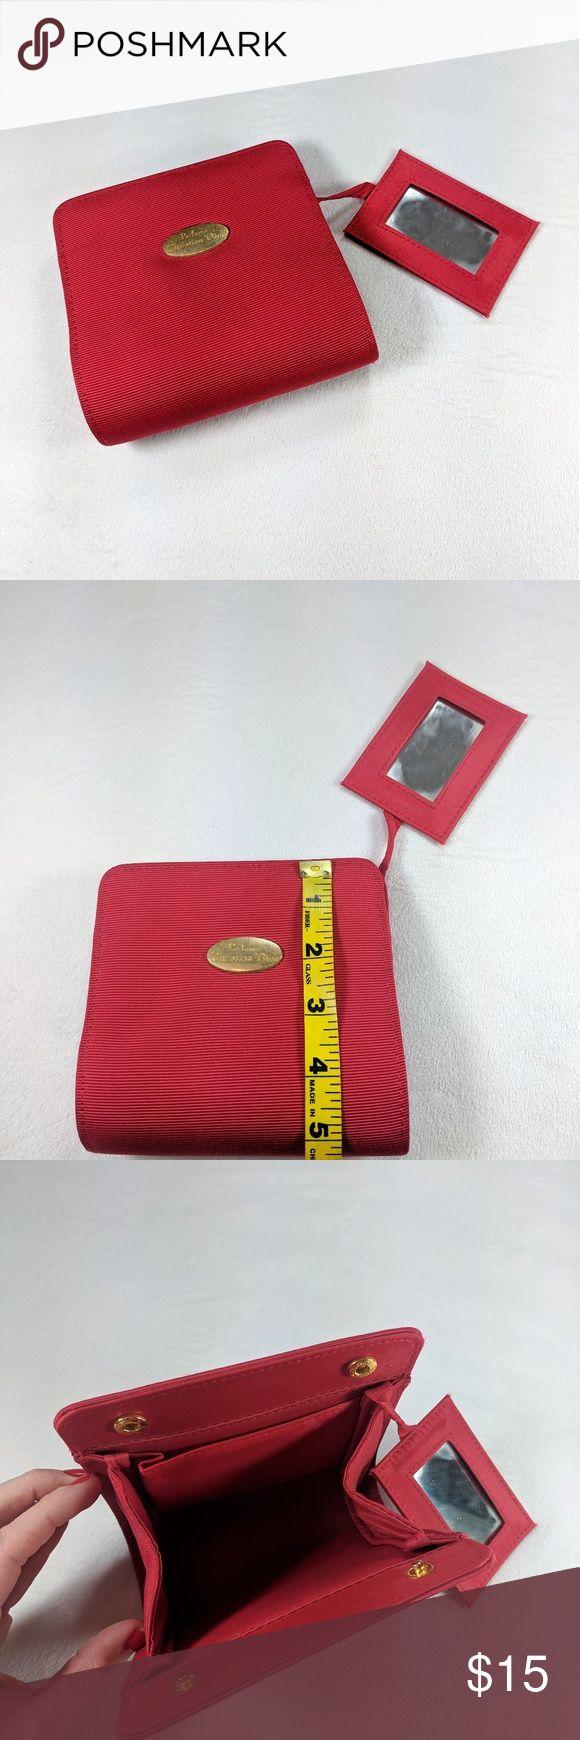 Vintage Christian Dior small cosmetic bag & mirror NWT